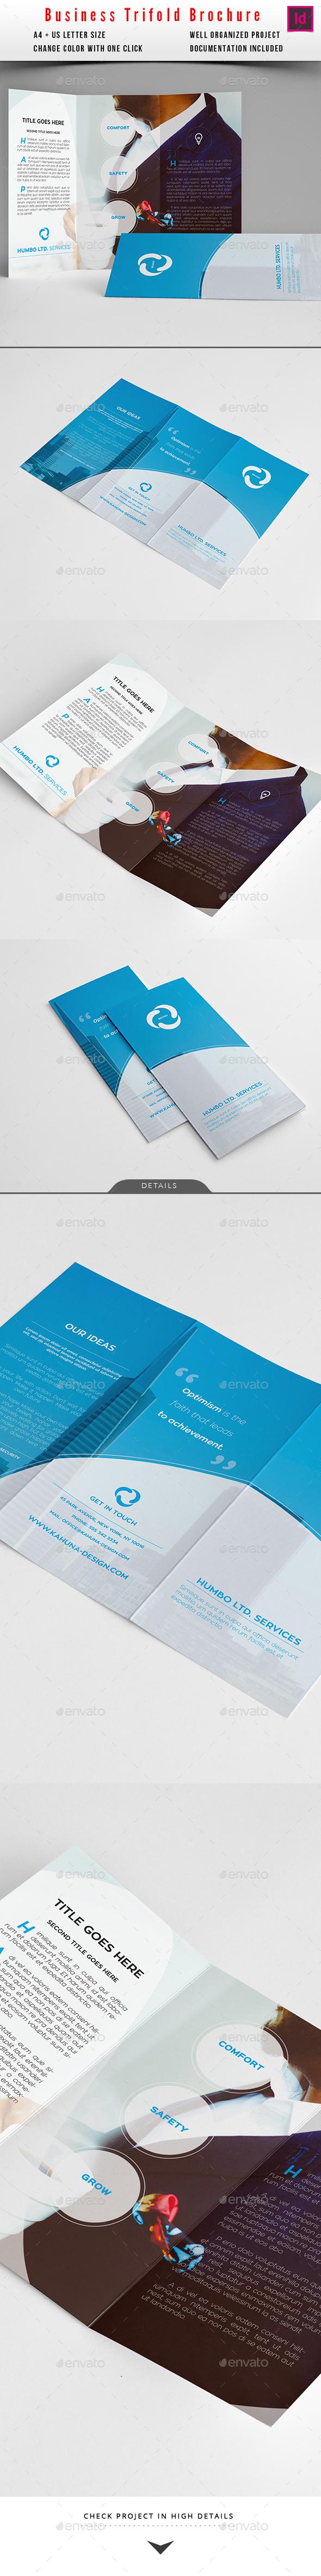 Trifold Modern Universal Business Brochure - Brochures Print Templates